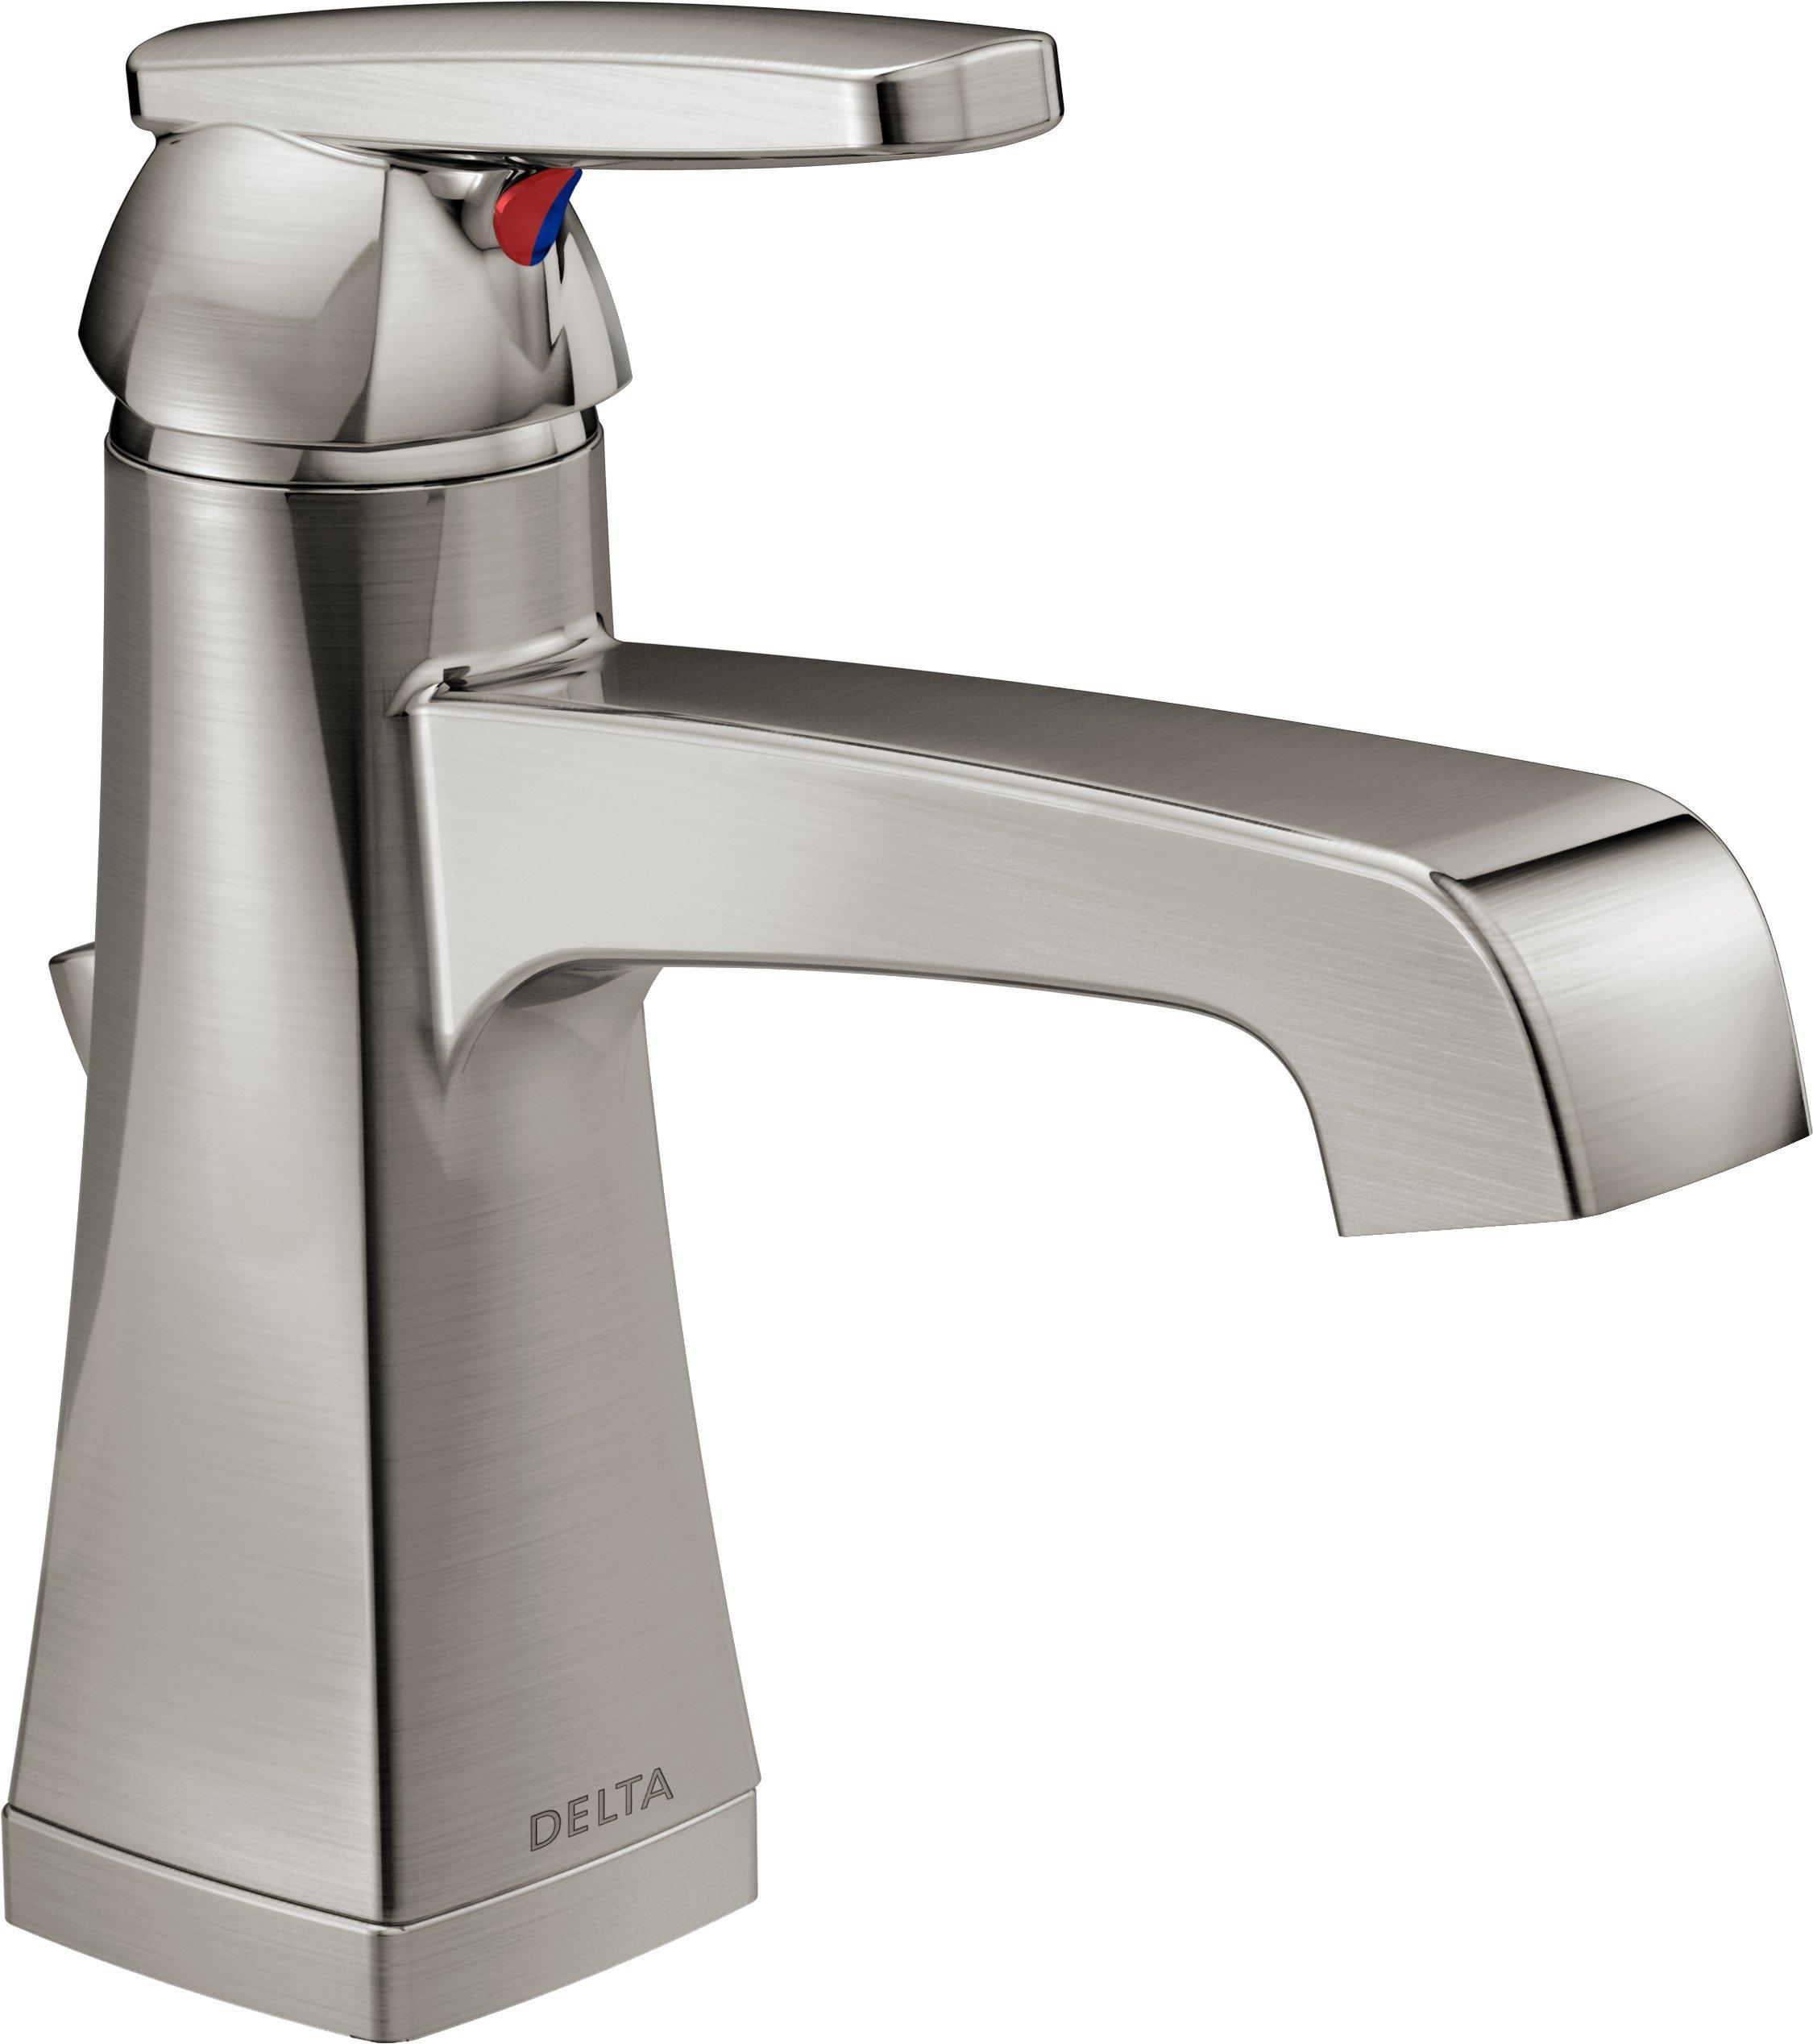 Delta Faucet 564-SSMPU-DST Ashlyn Single Handle Centerset Bathroom Faucet, Stainless